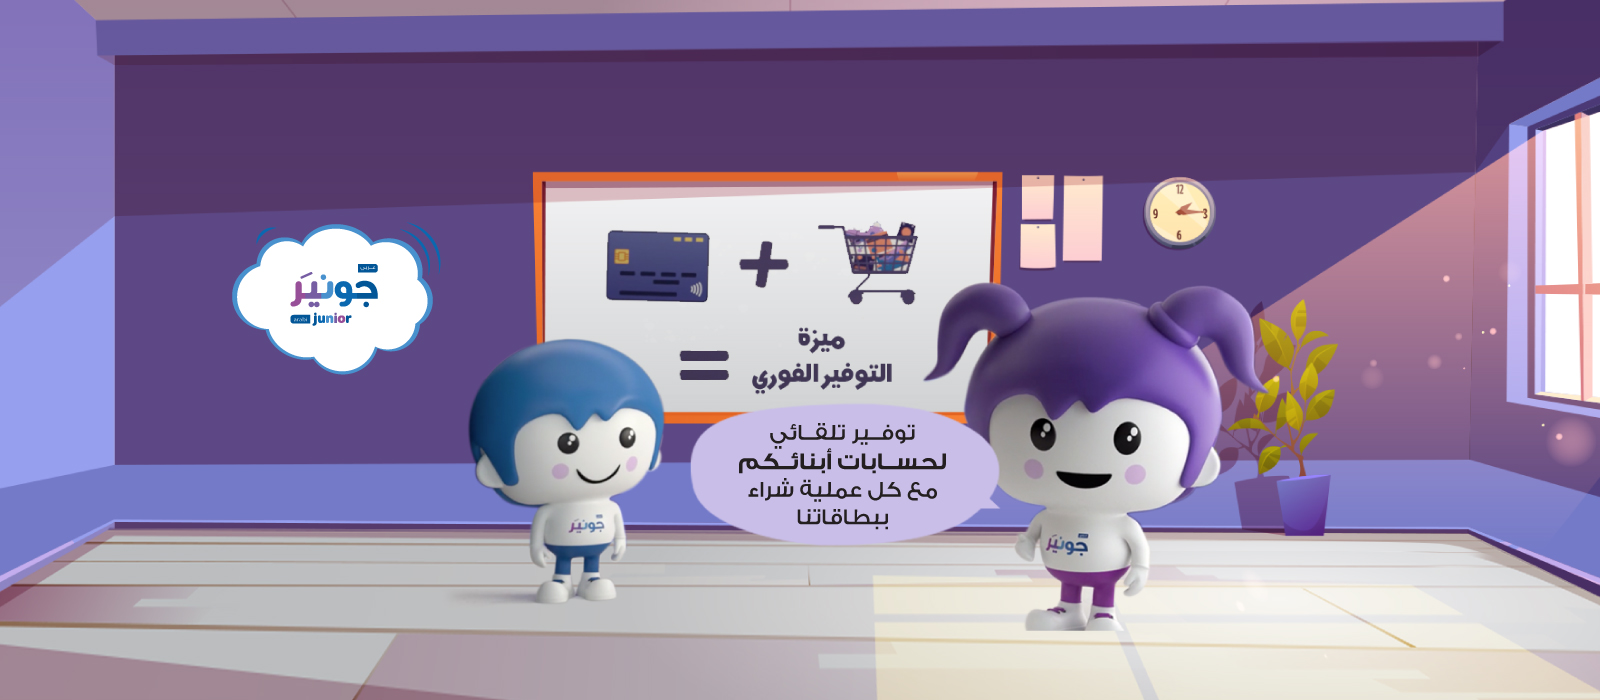 20 June 21 - AJ-Instant-saving--Website-banner-Amend4-AR